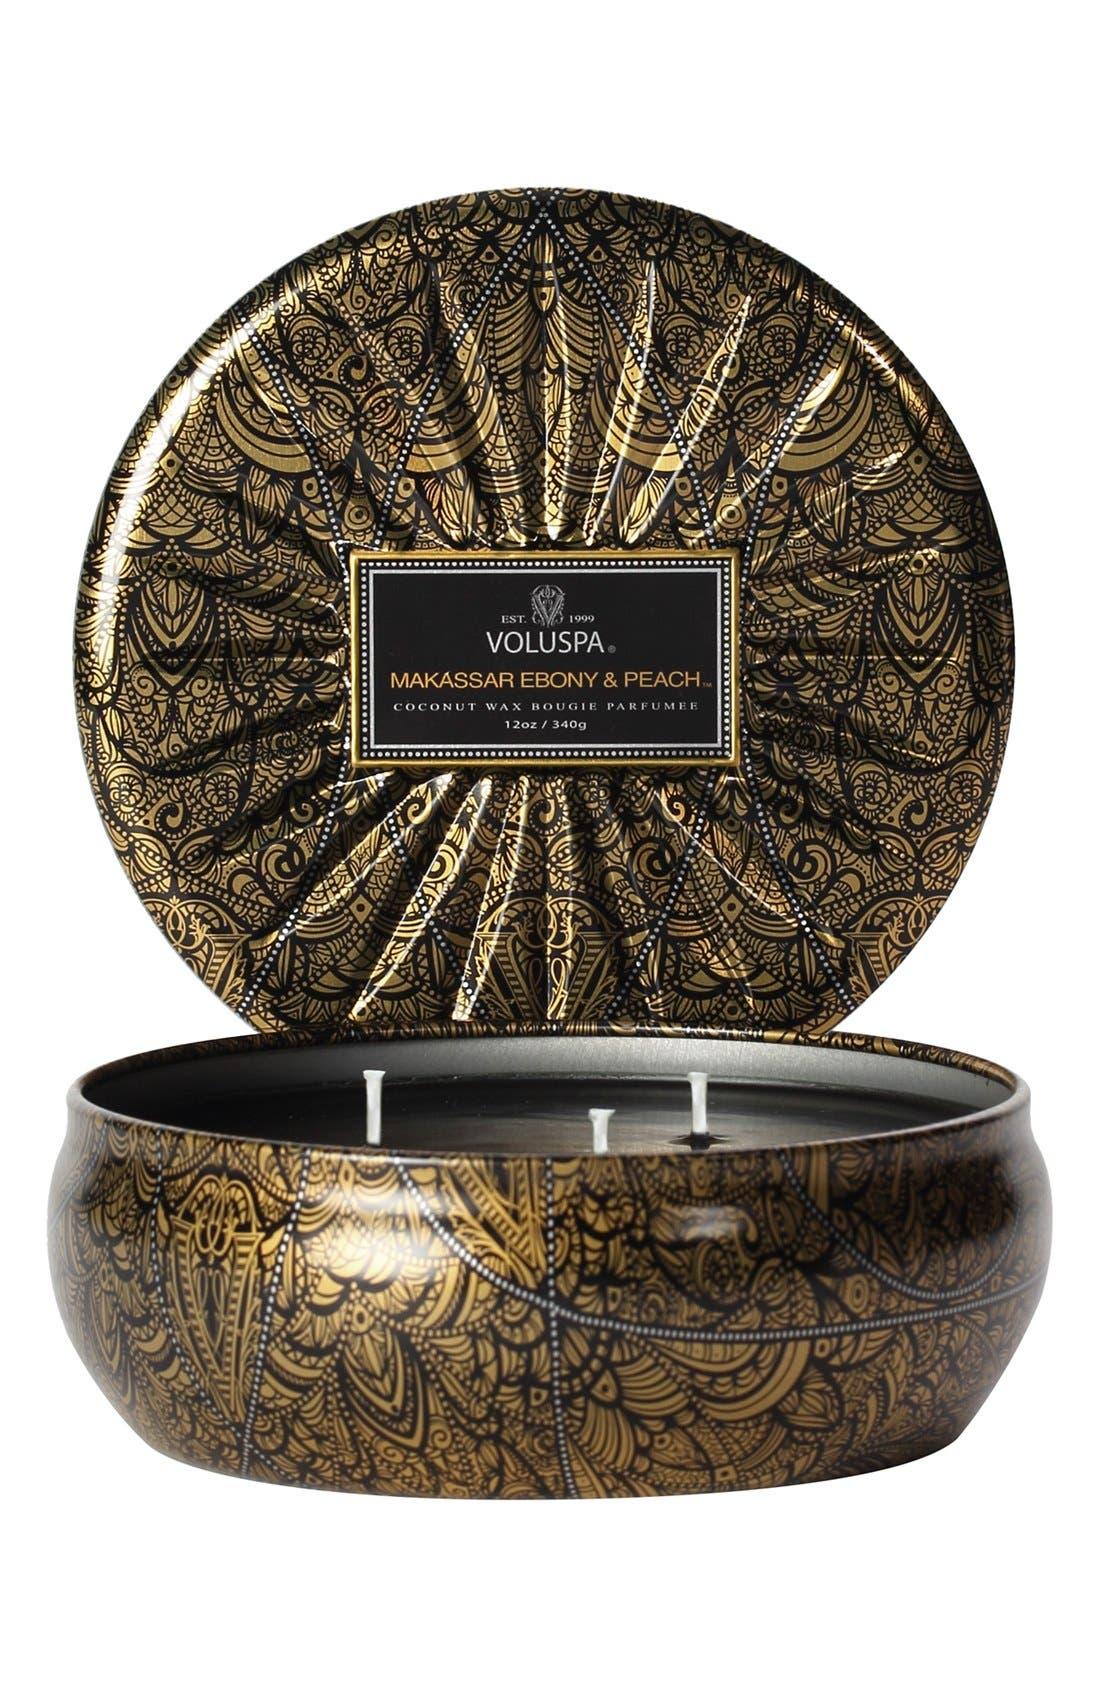 Alternate Image 1 Selected - Voluspa 'Vermeil - Makassar Ebony & Peach' 3-Wick Candle